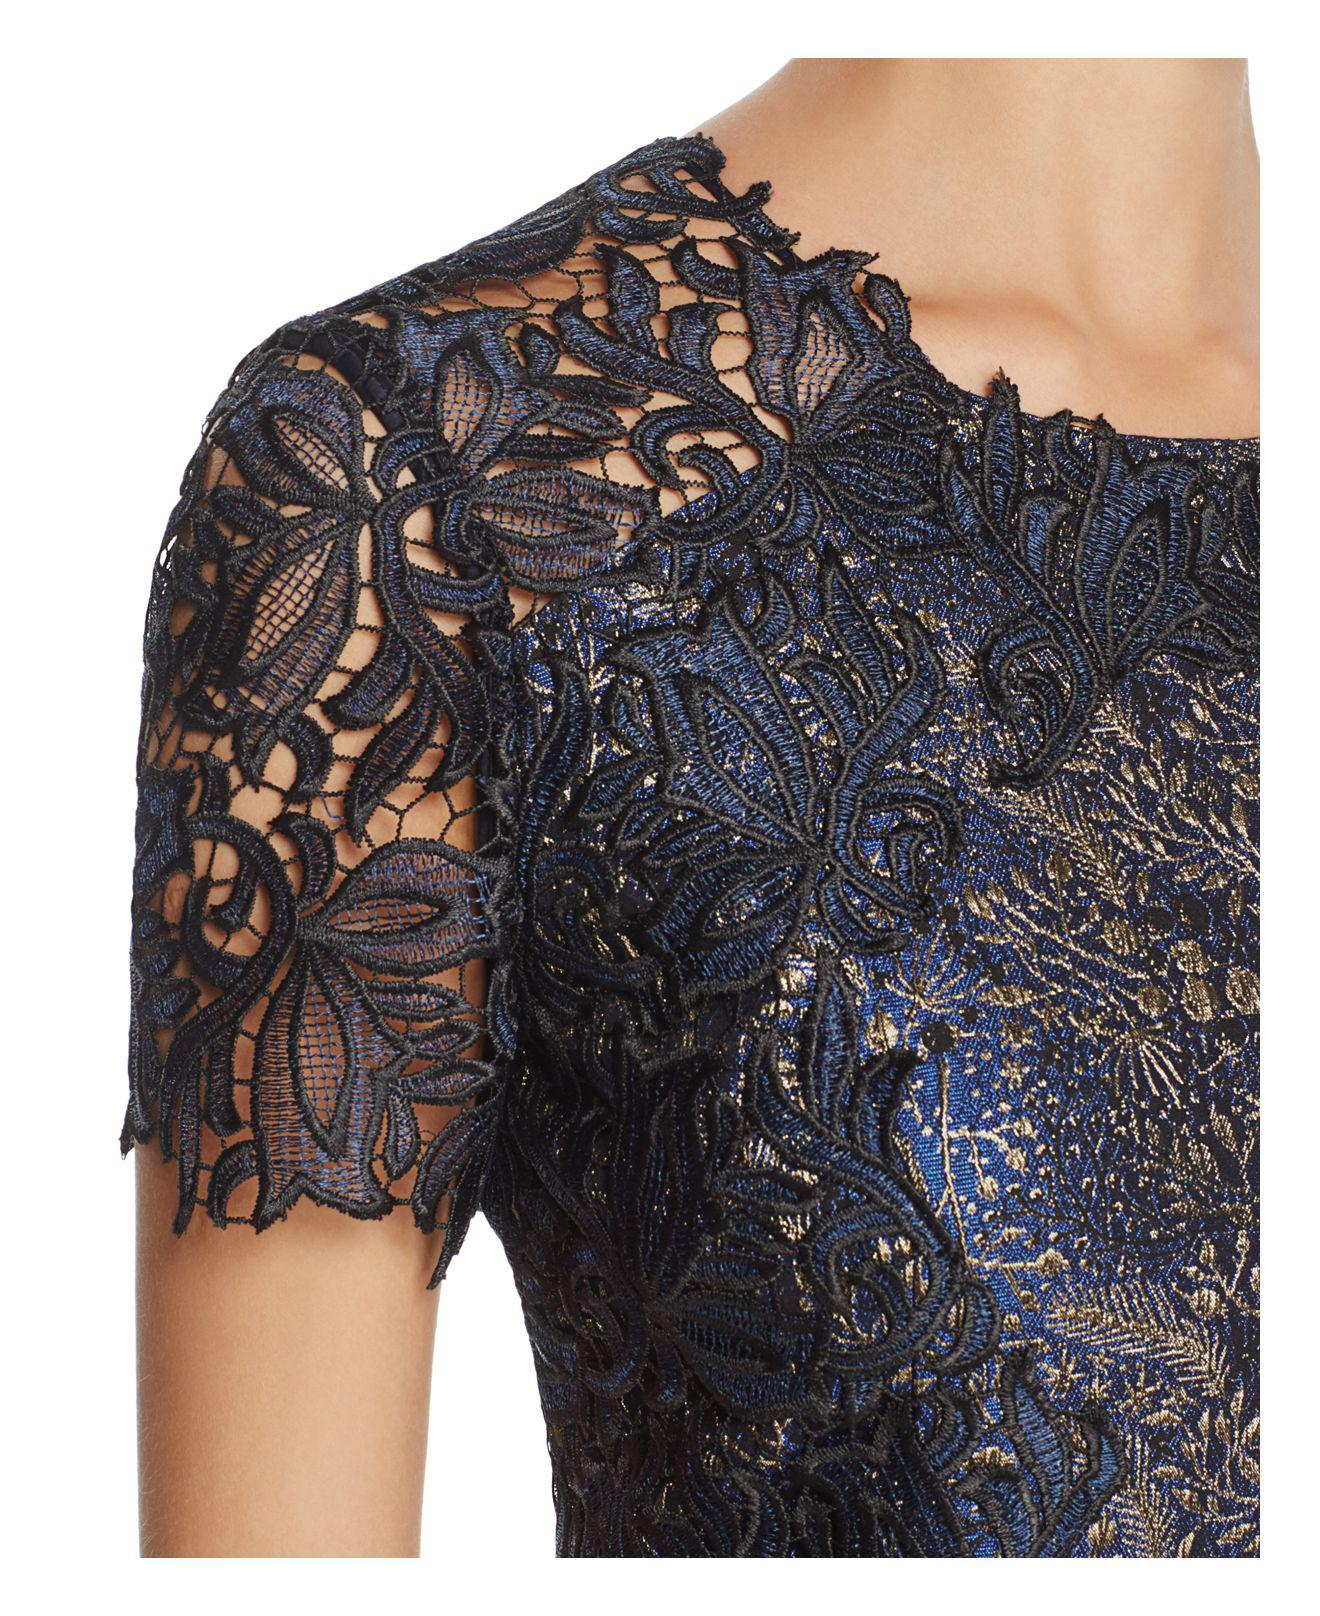 Galine lace cocktail dress